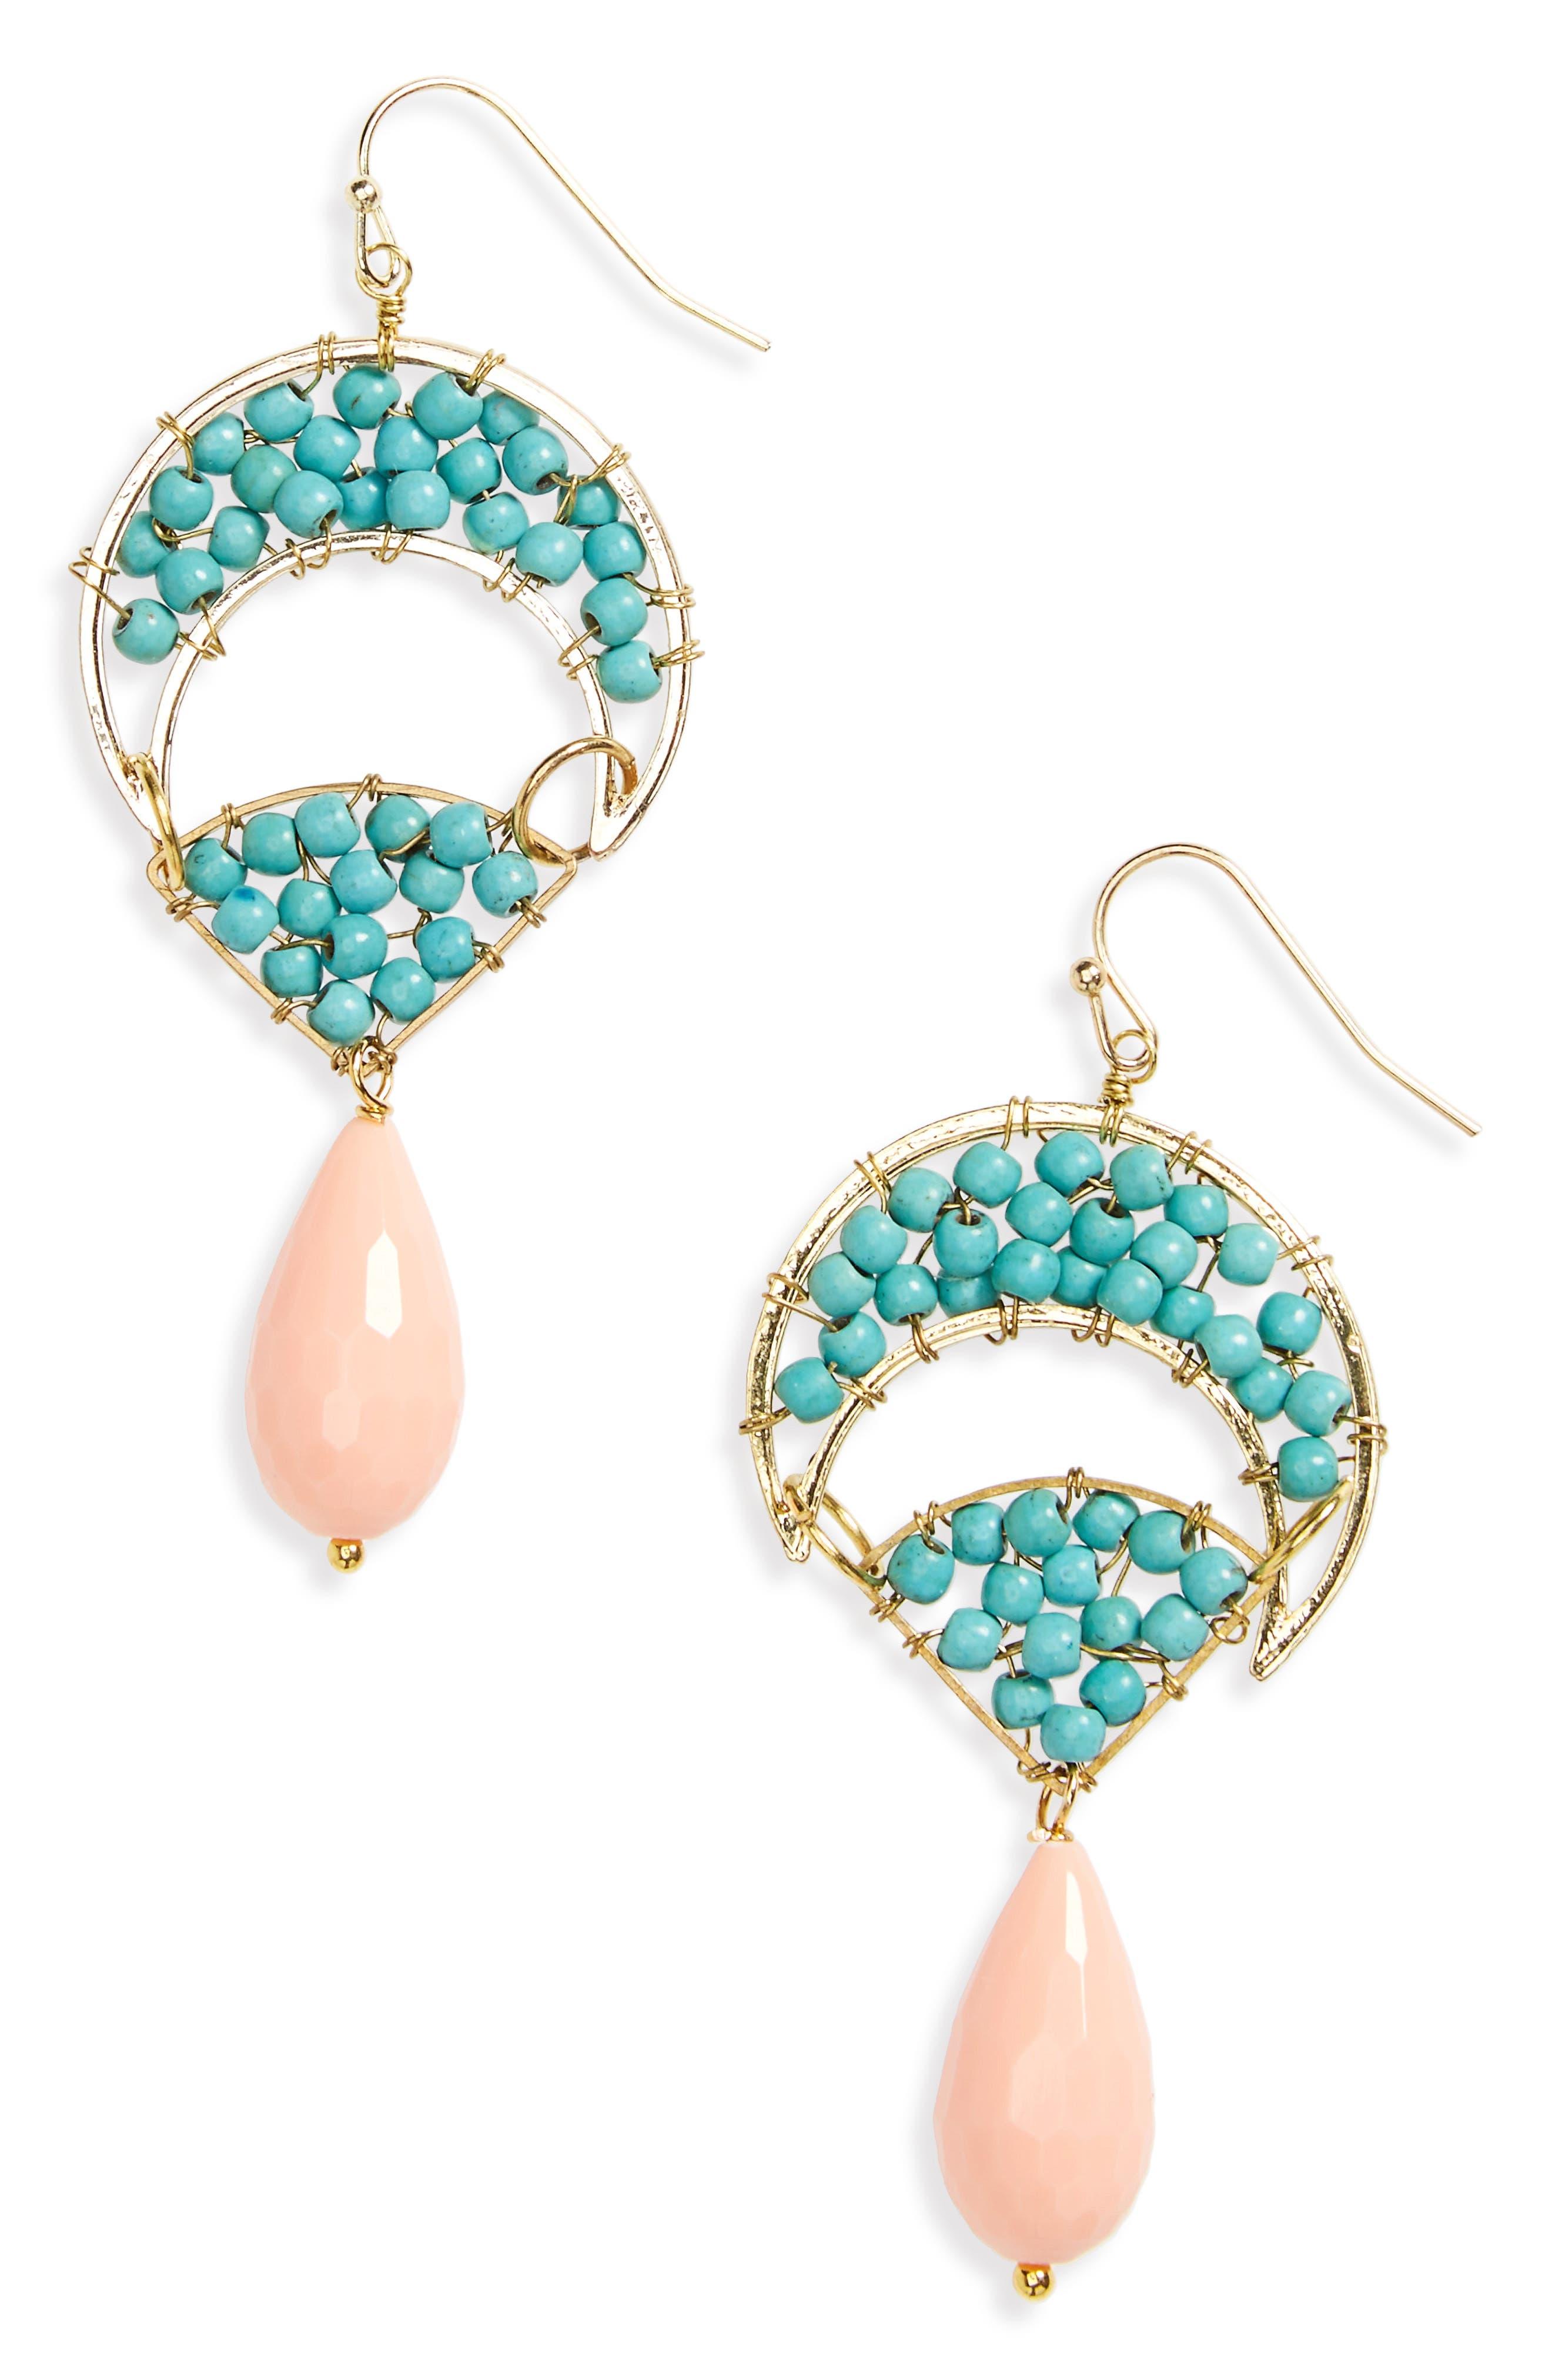 Beaded Howlite Stone Drop Earrings,                             Main thumbnail 1, color,                             Multi